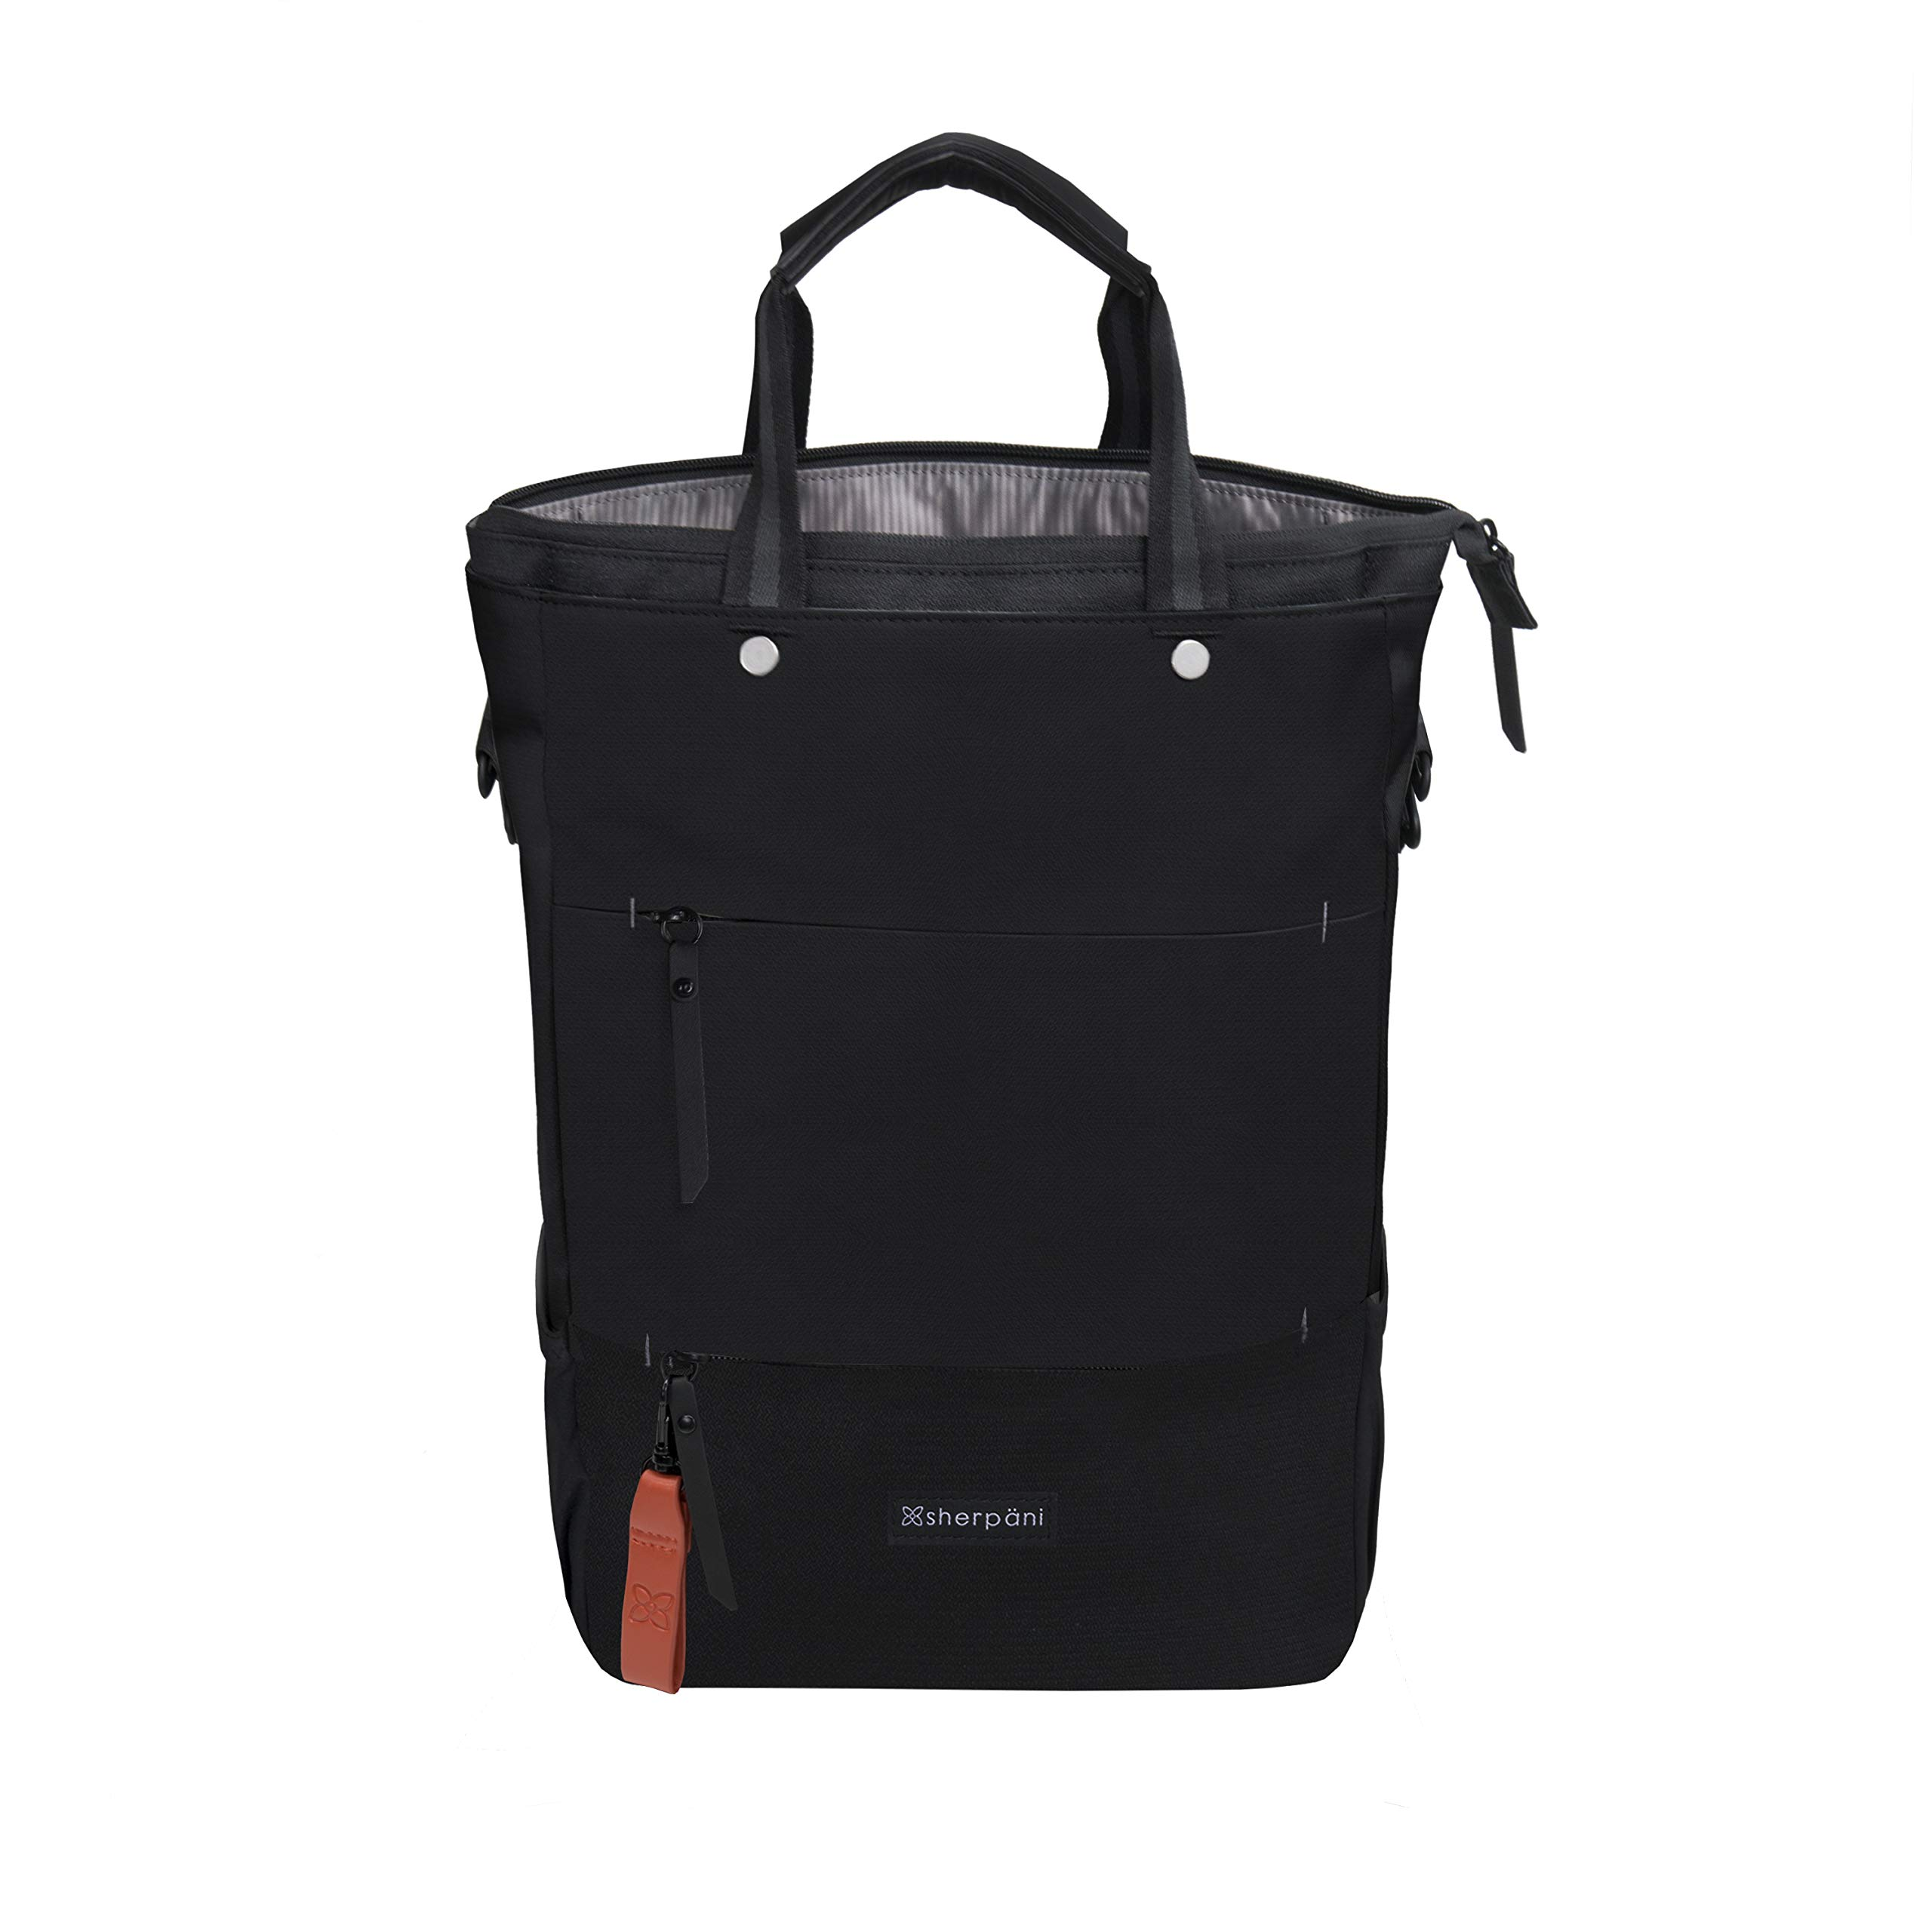 Sherpani Camden Raven Laptop Backpack, Raven by Sherpani (Image #2)